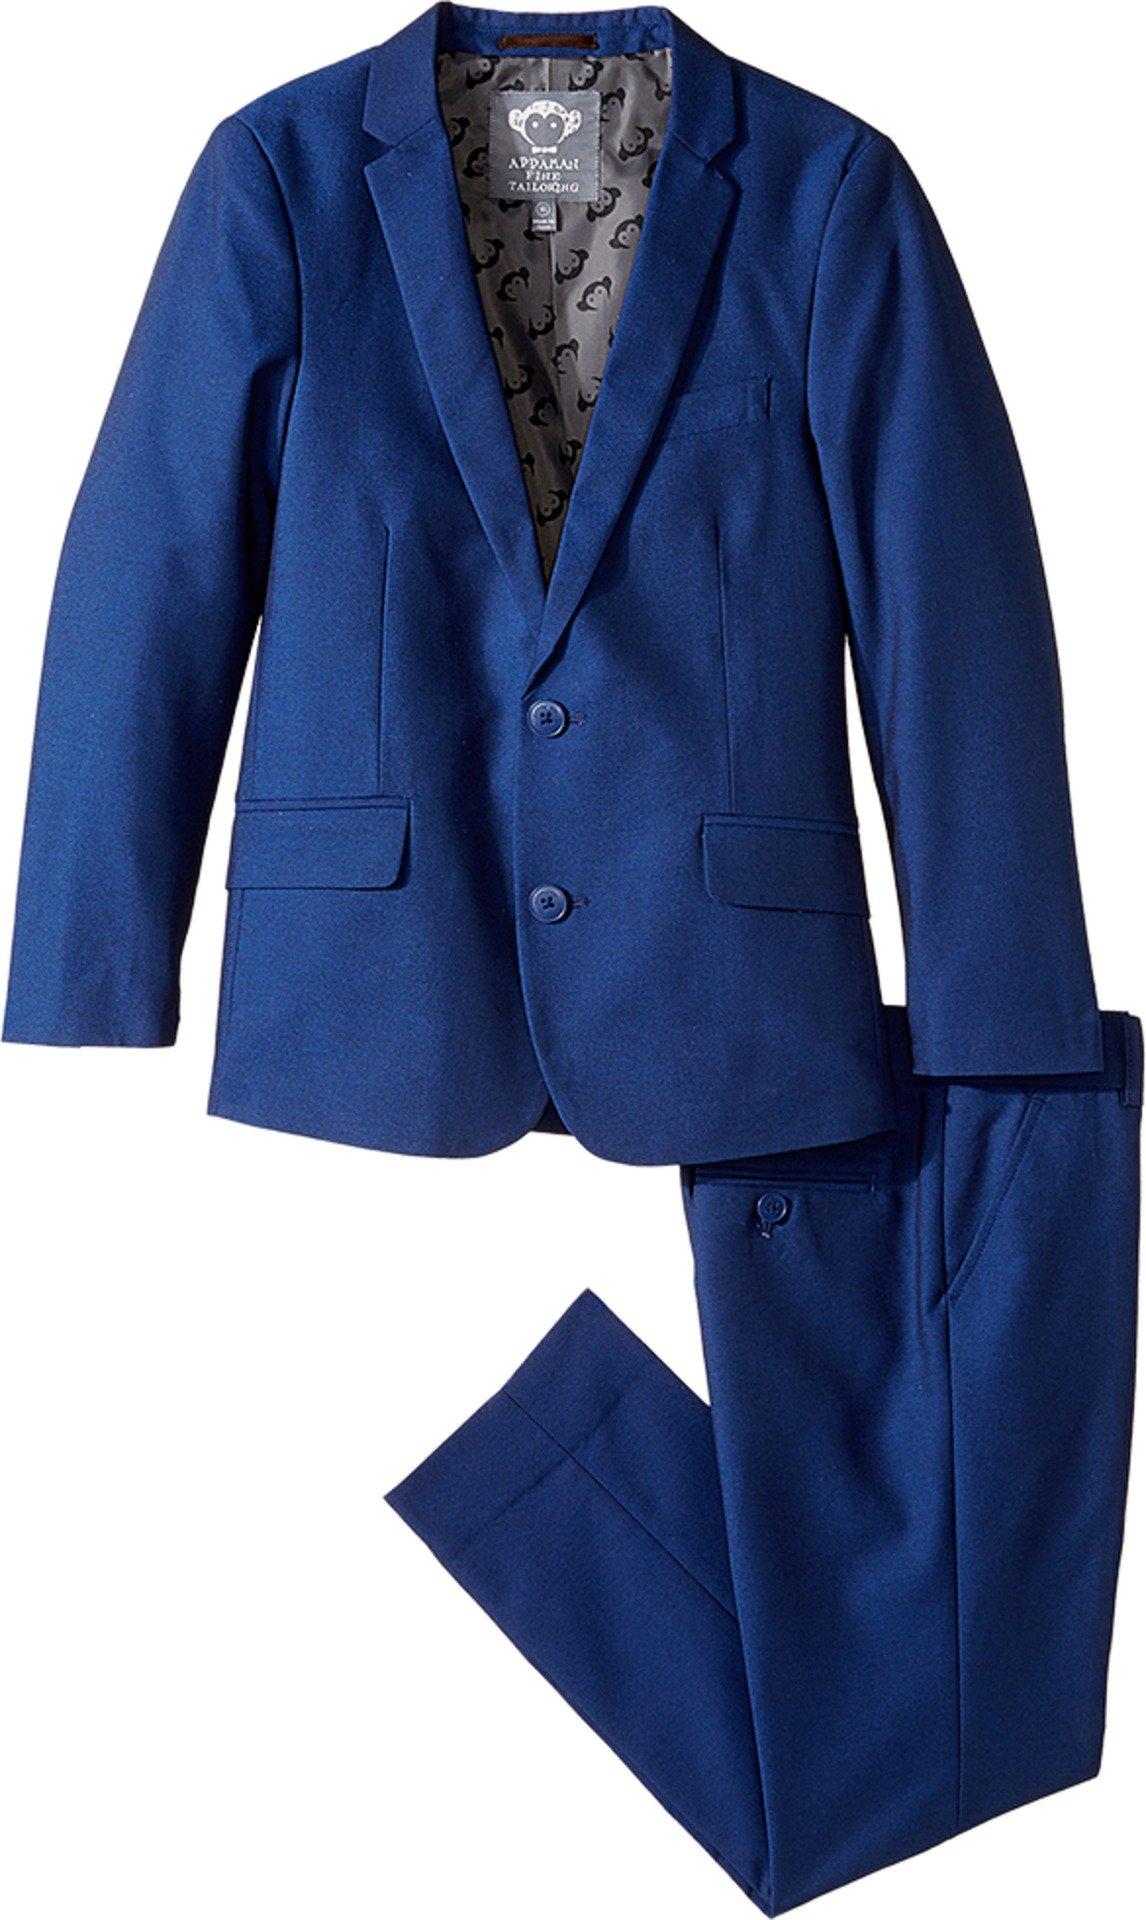 Appaman Boys' Mod Suit, Deep Cobalt, 3T